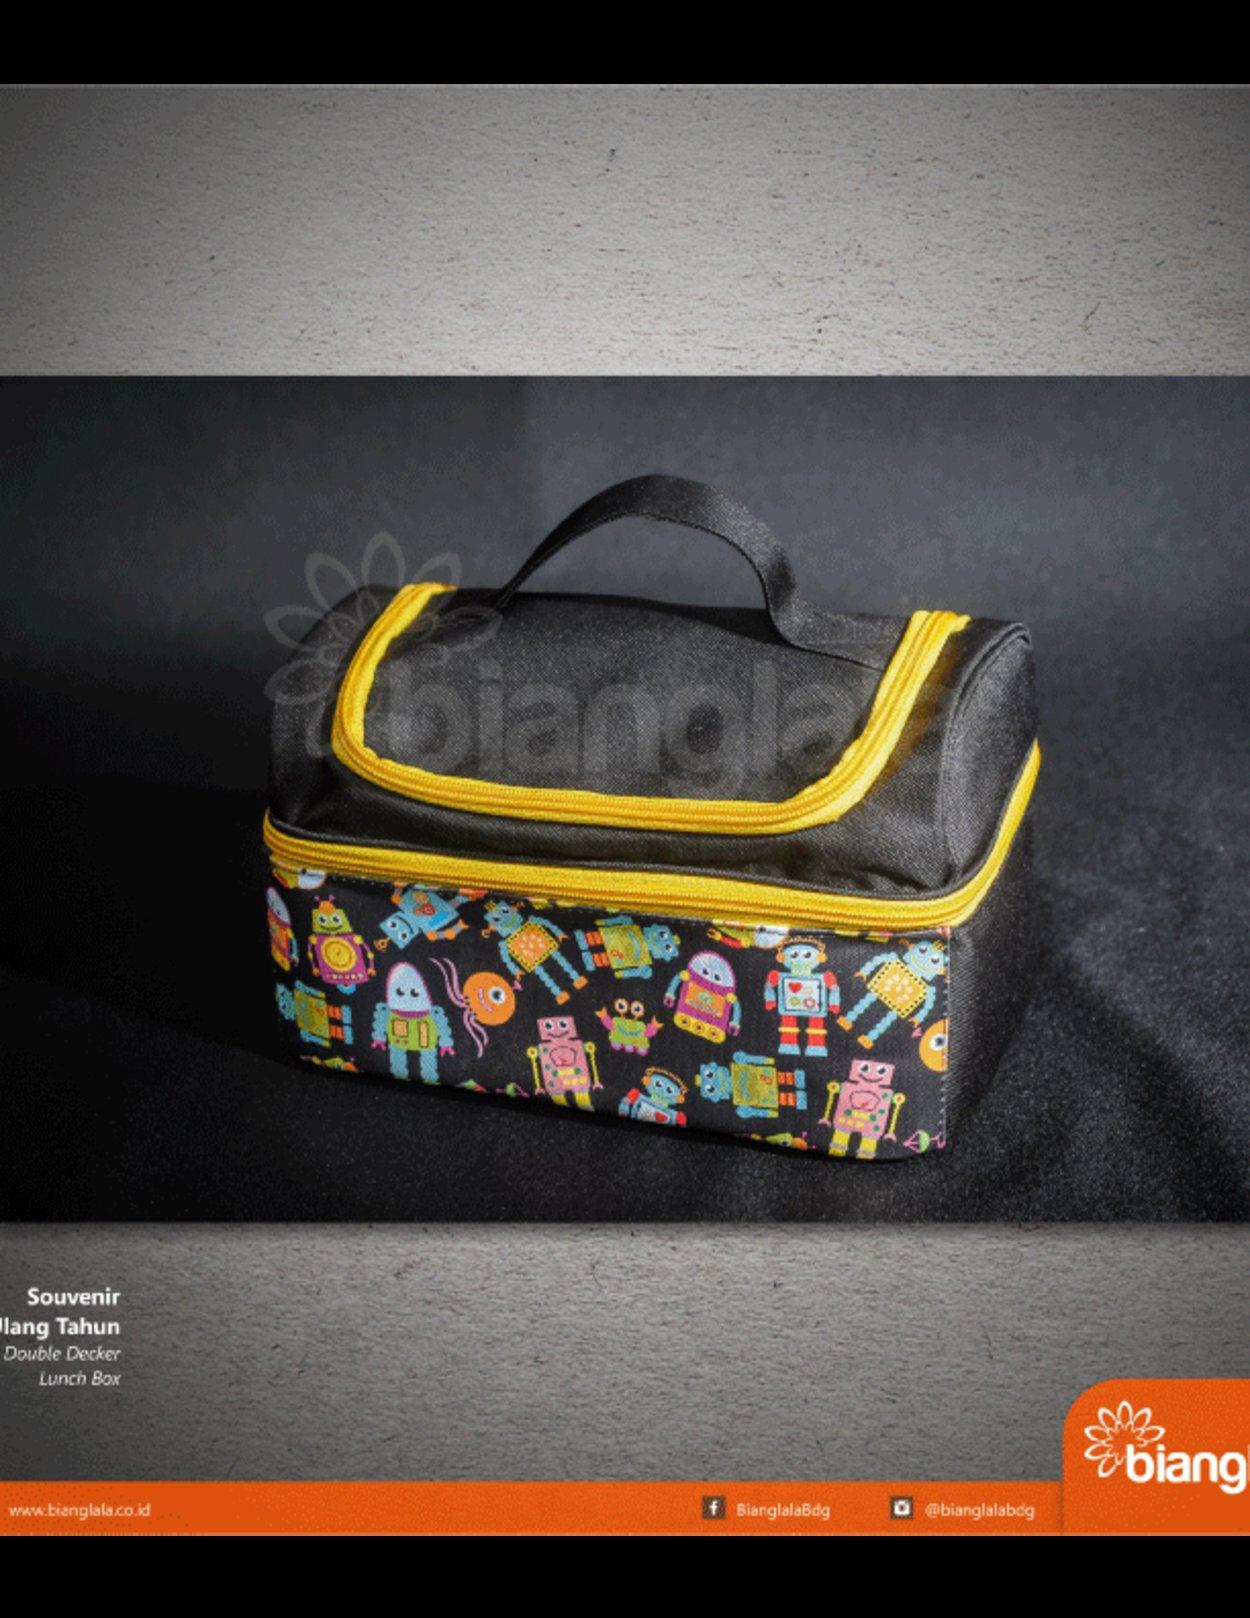 Souvenir-Ulang-Tahun_Double-Decker-Lunch-Box